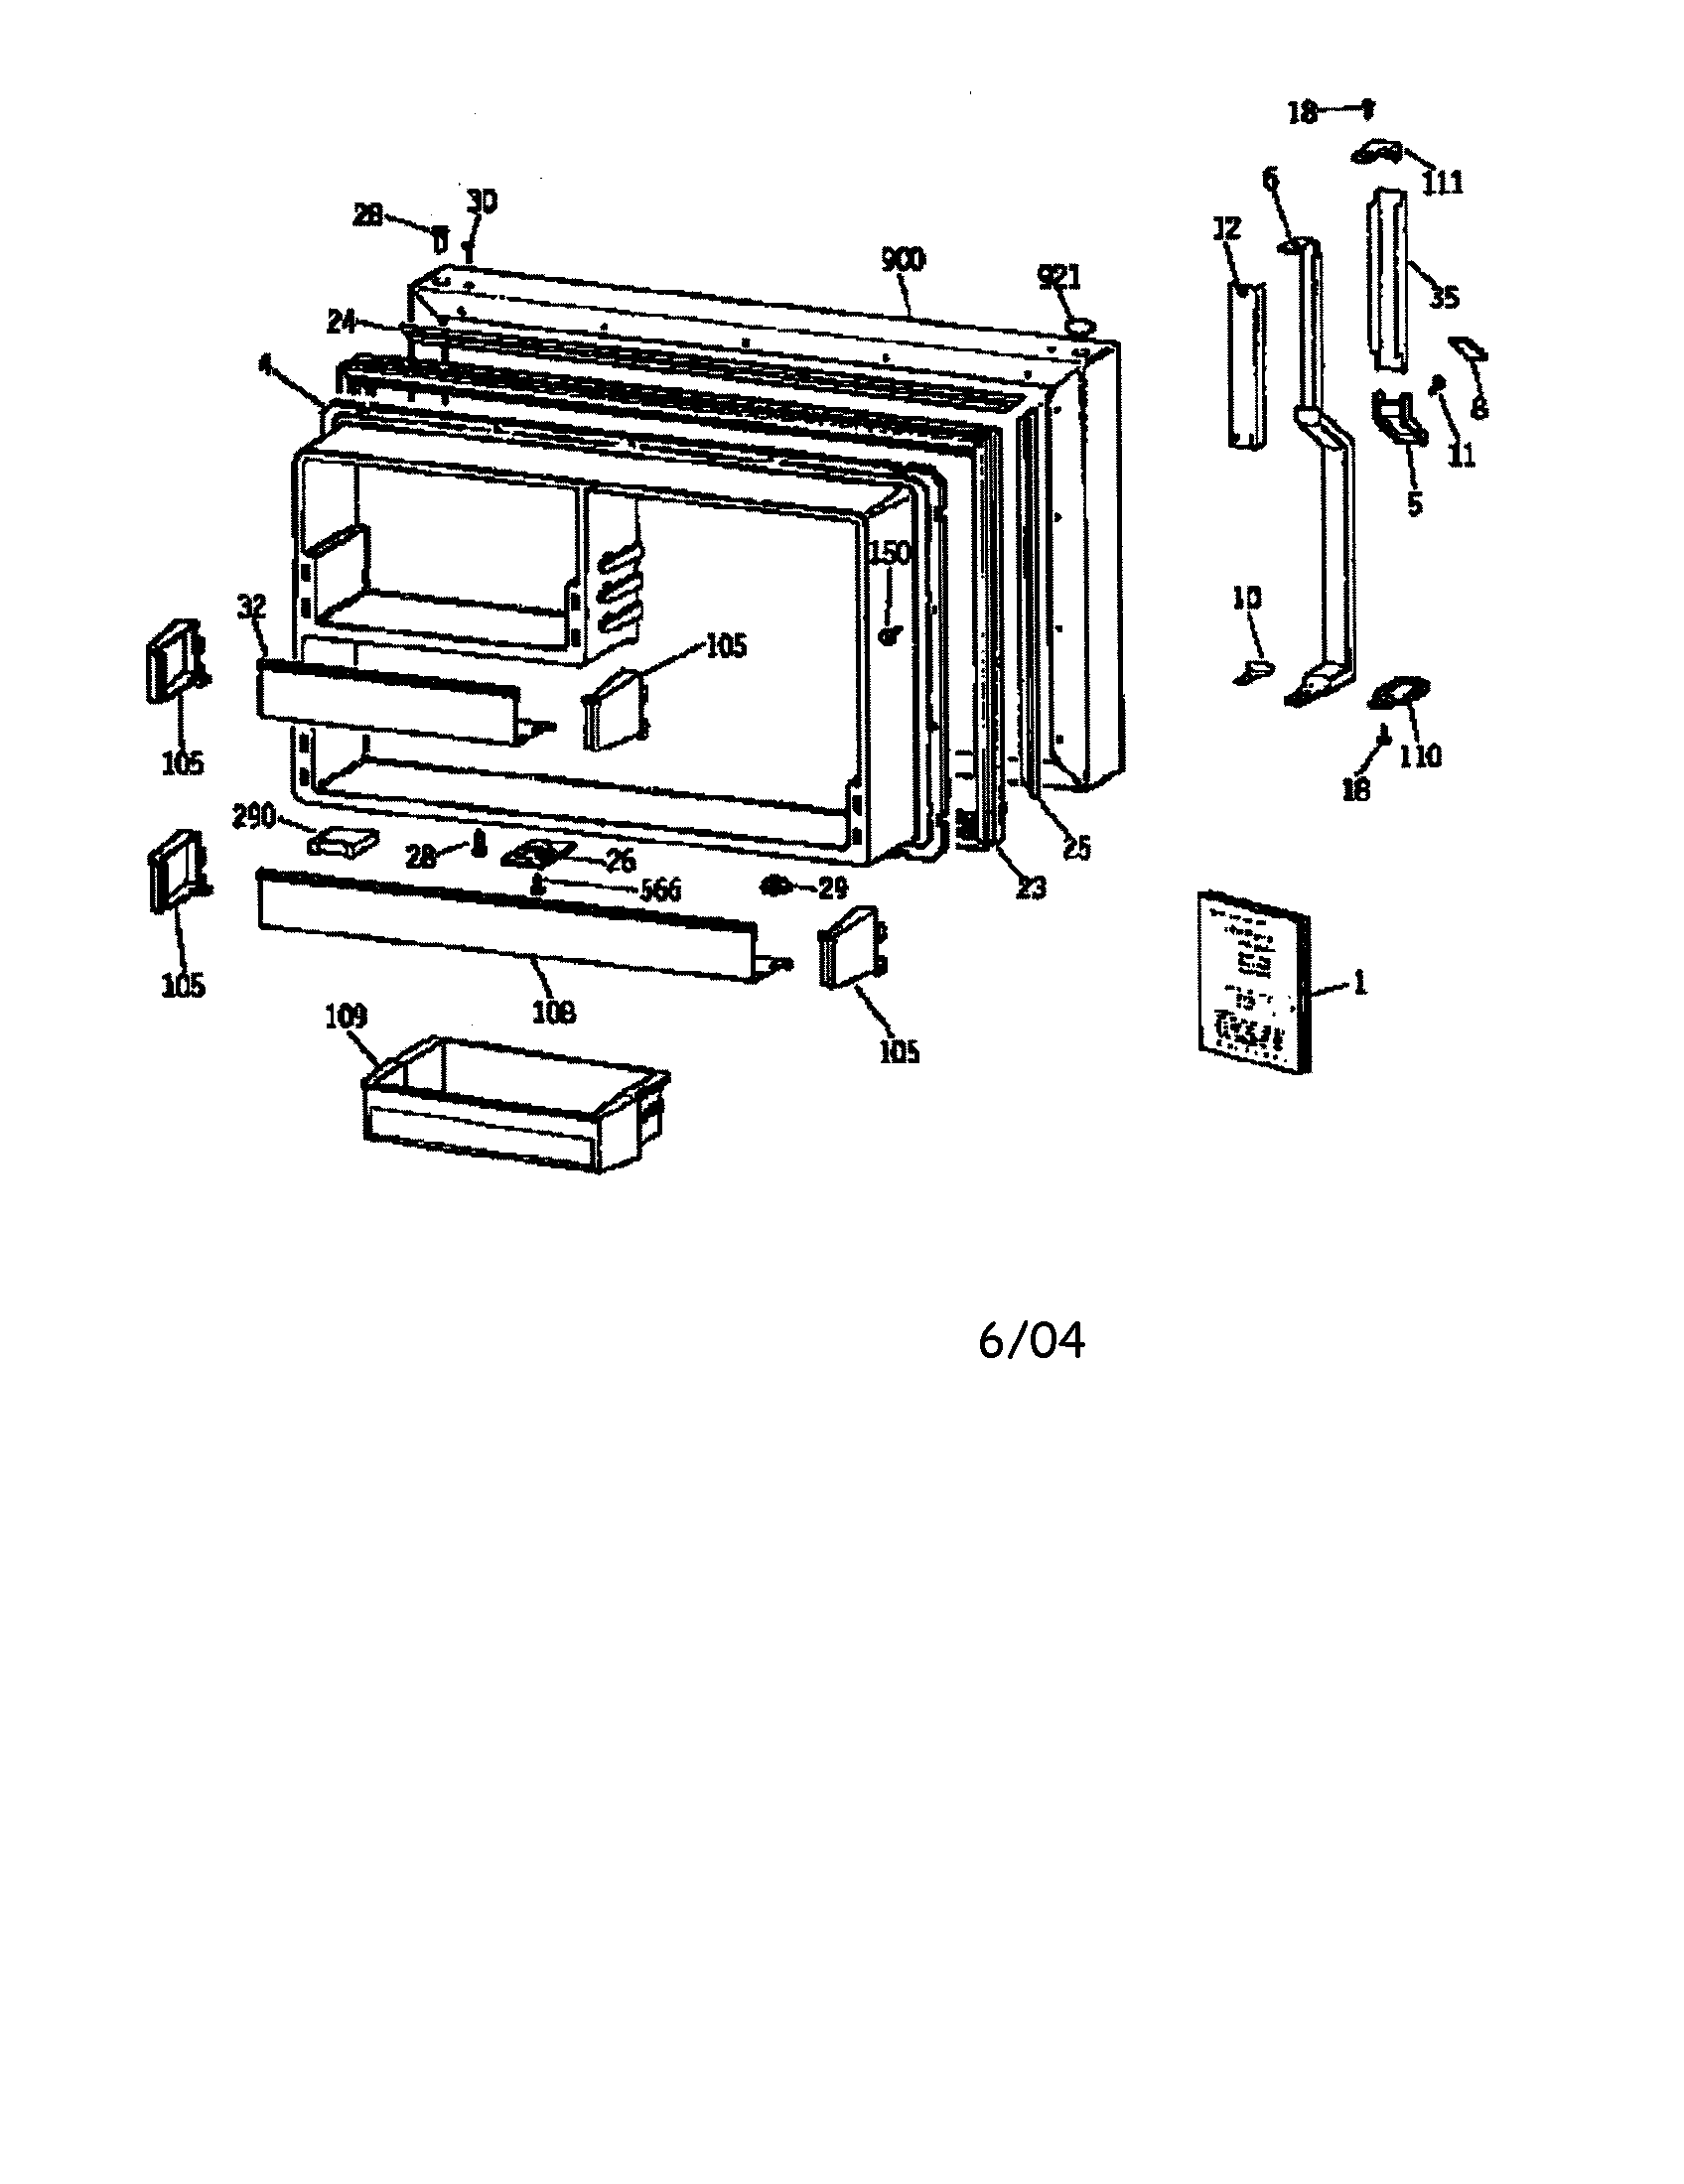 Kenmore 363 Refrigerator Ice Maker Assembly Kit